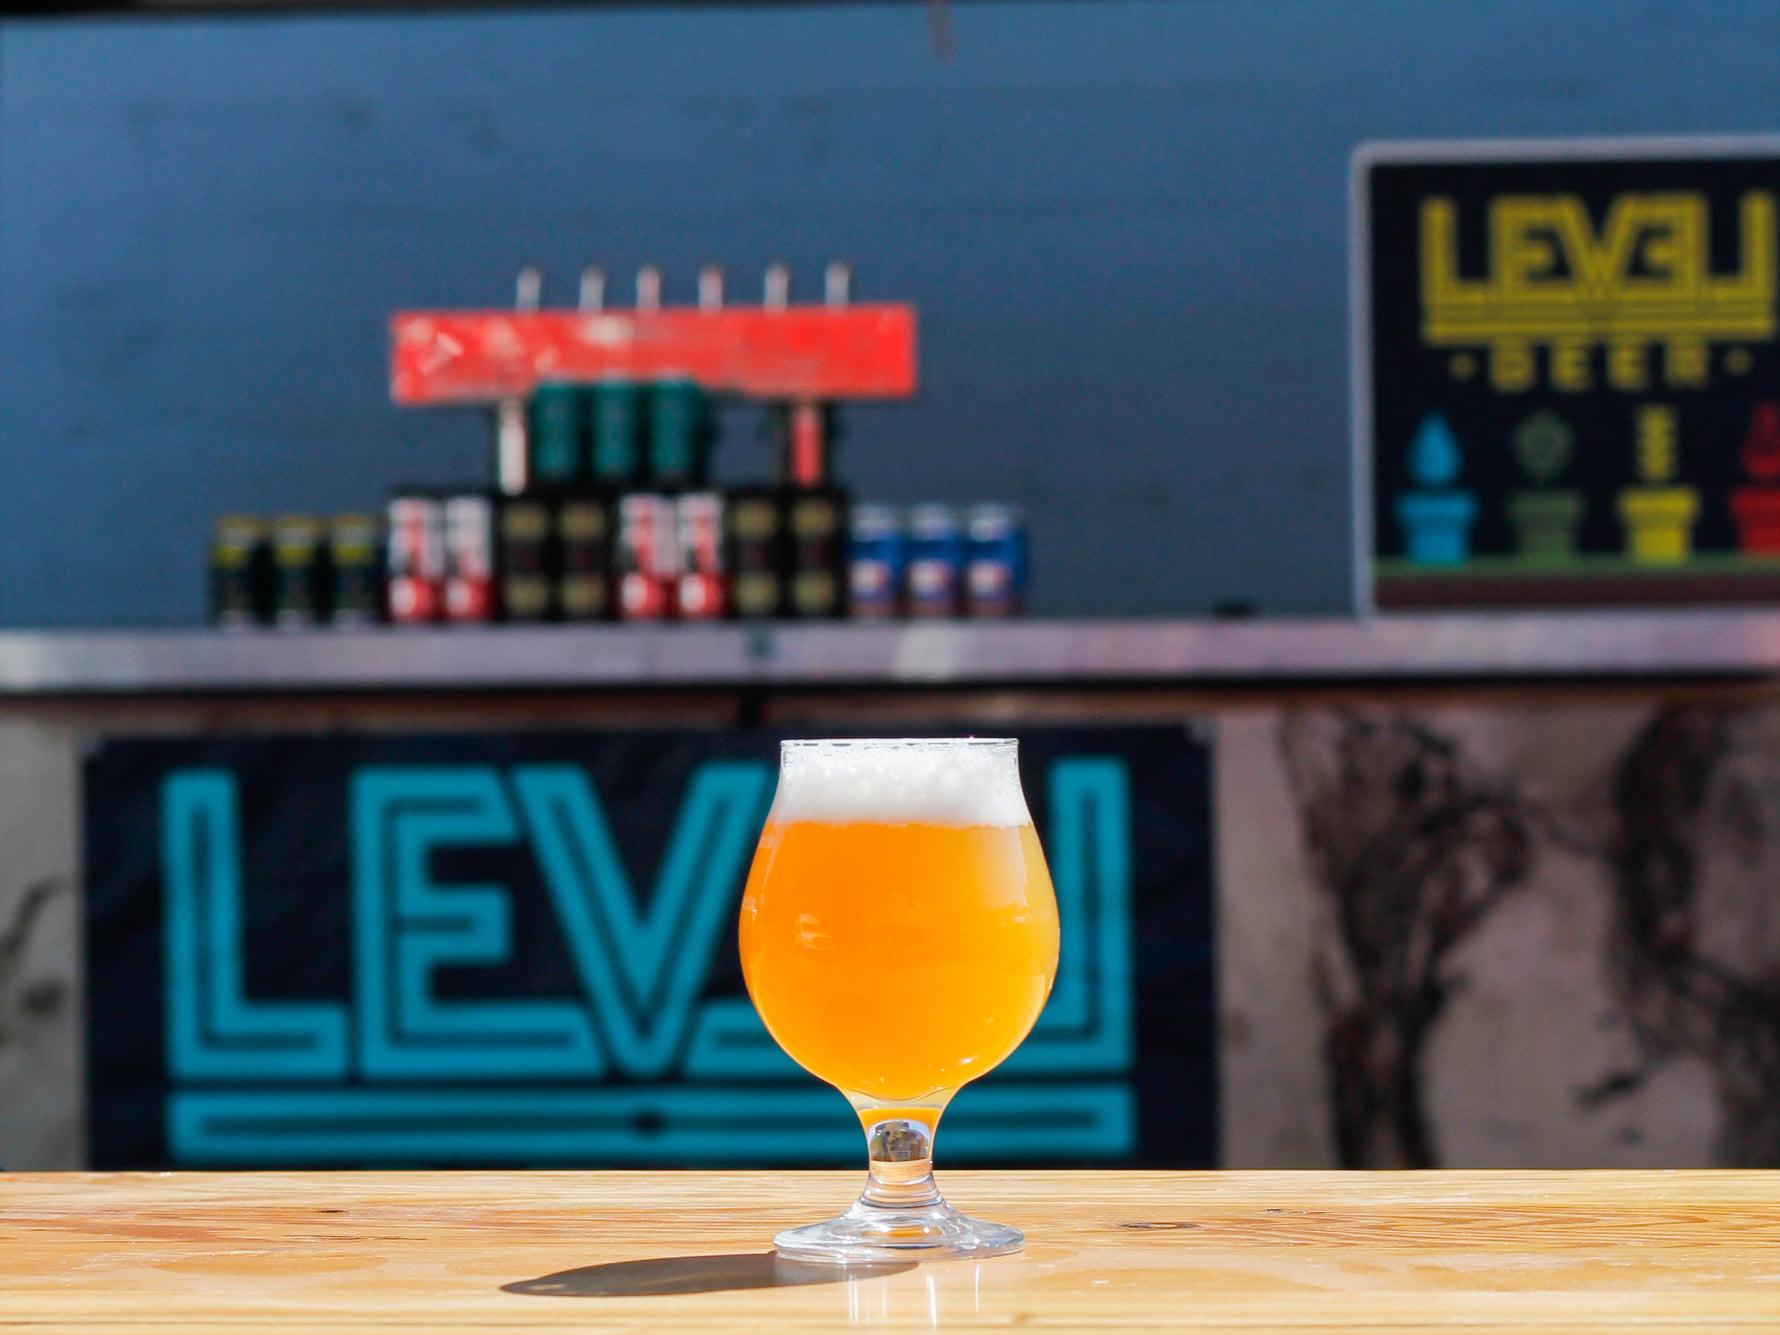 image of Level 3 courtesy of Level Beer